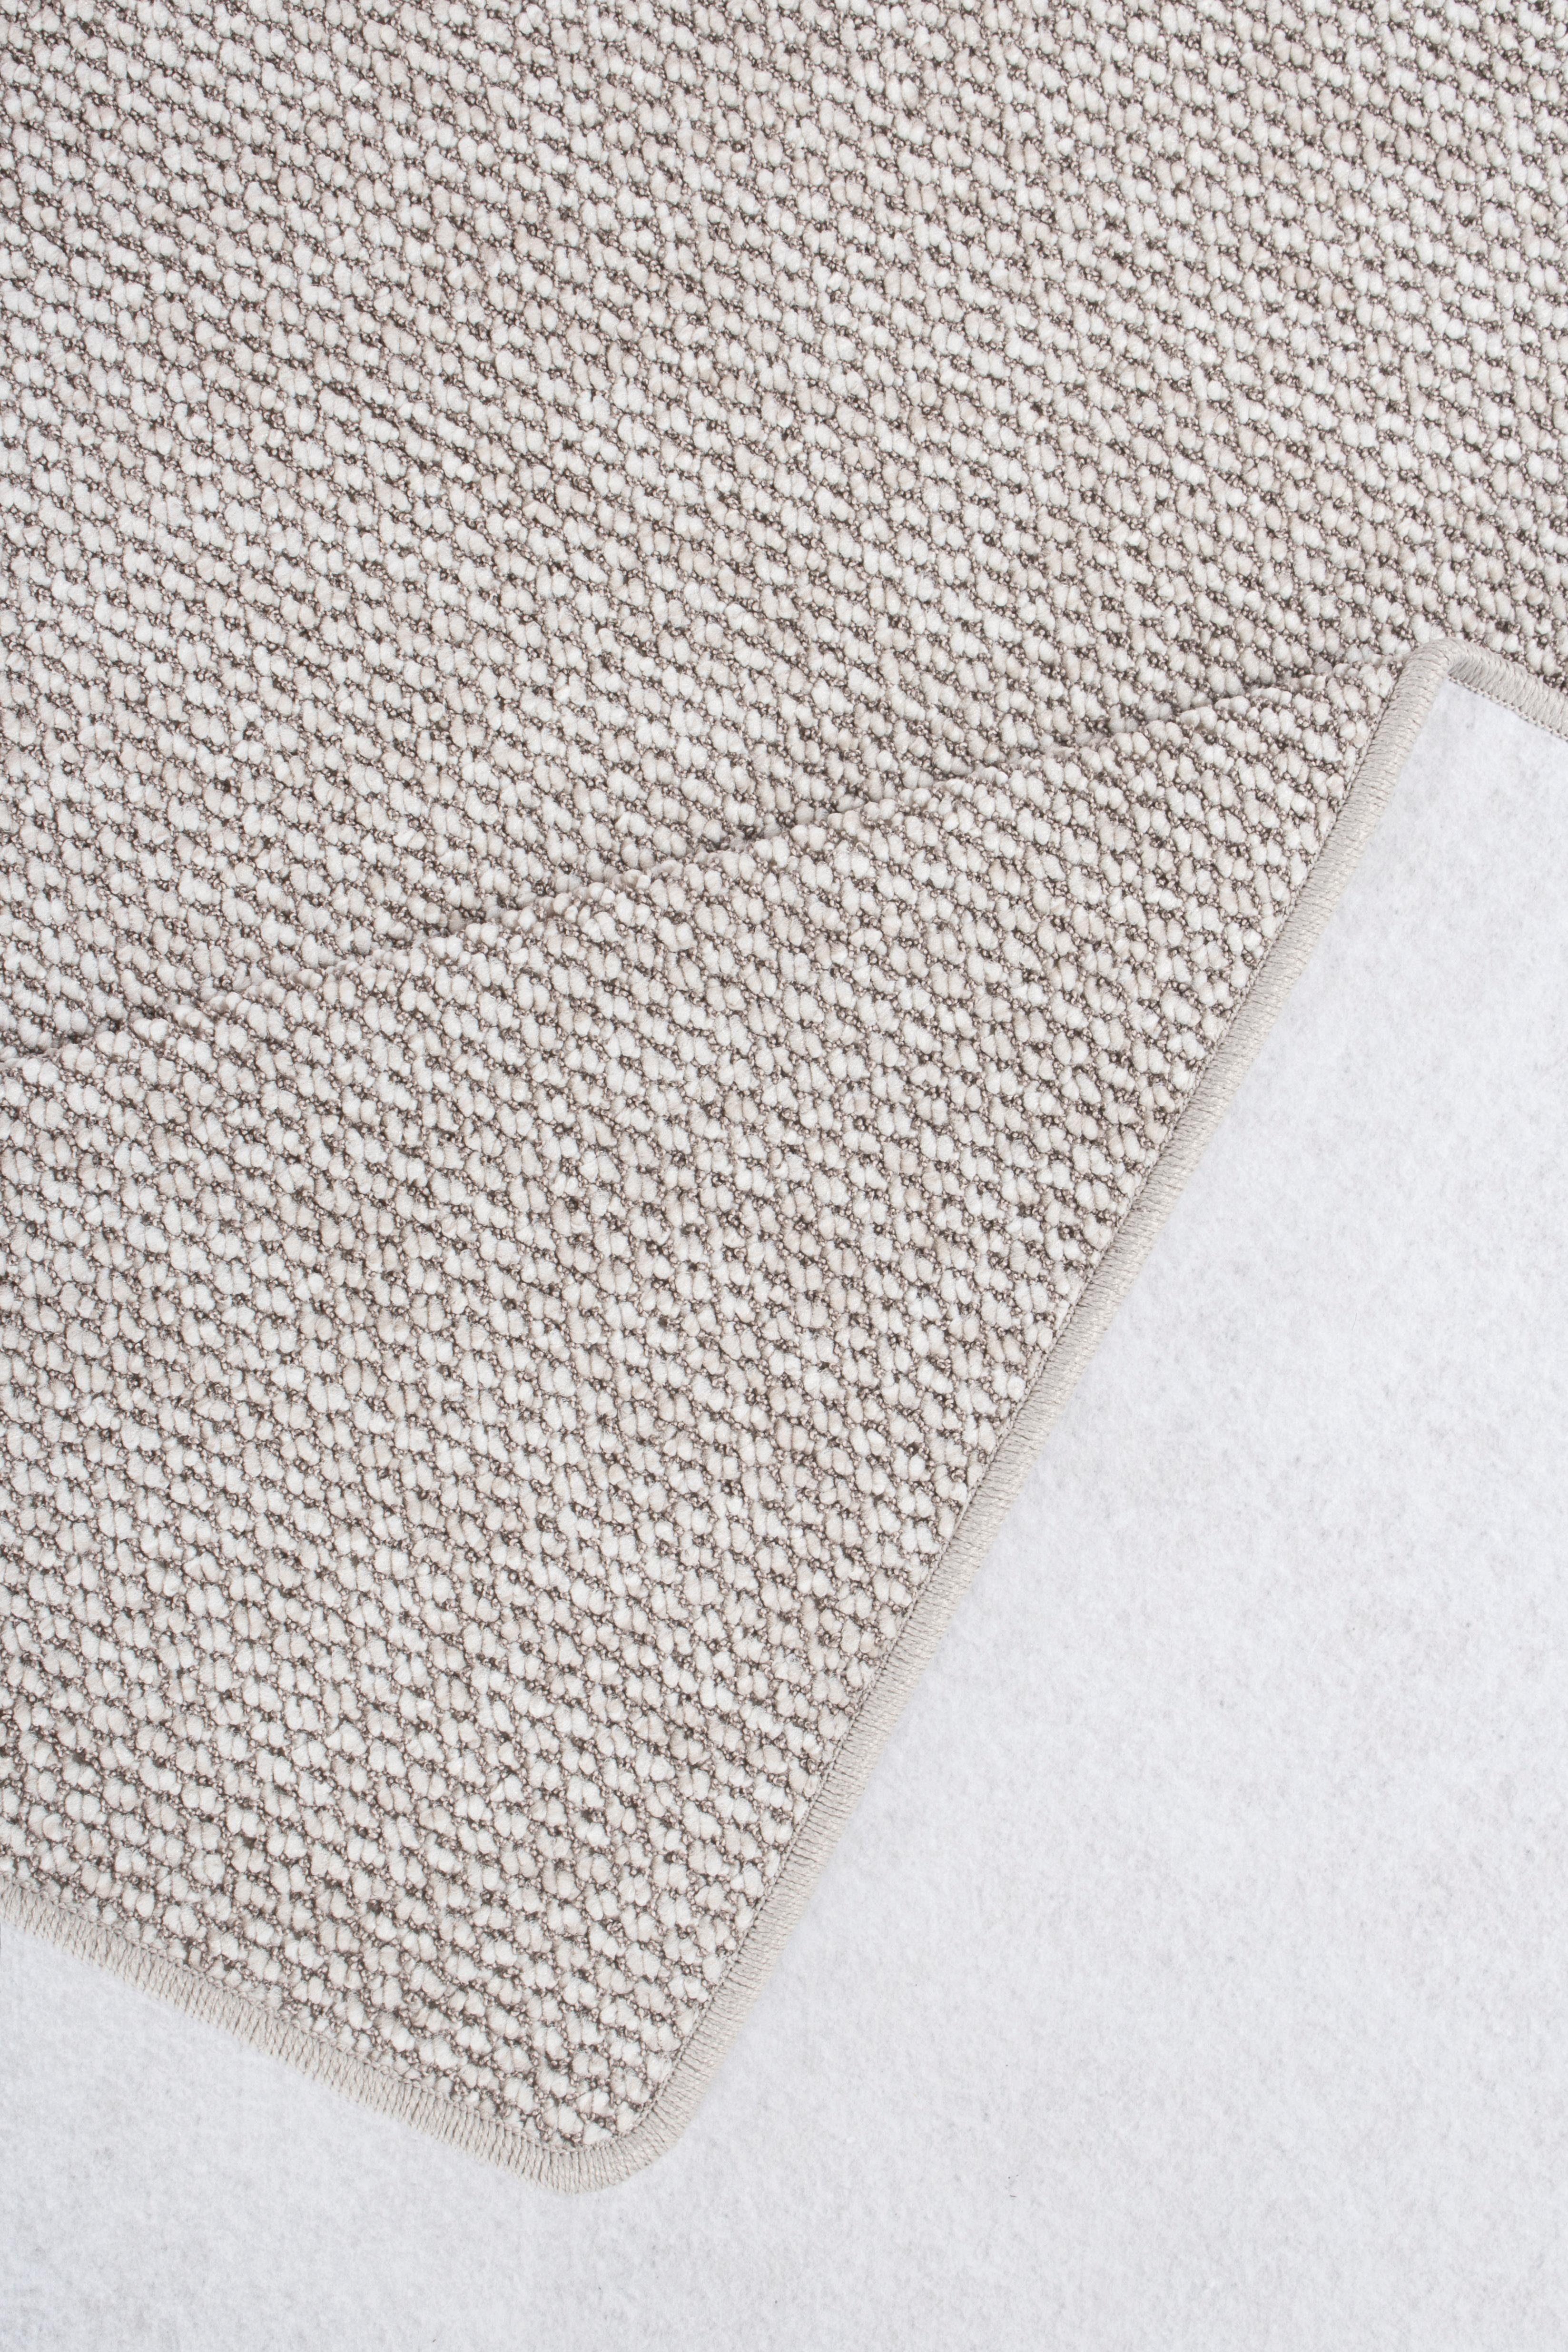 Teppich Darlington, LUXOR living, rechteckig, Höhe 5 mm, Wunschmaß online kaufen